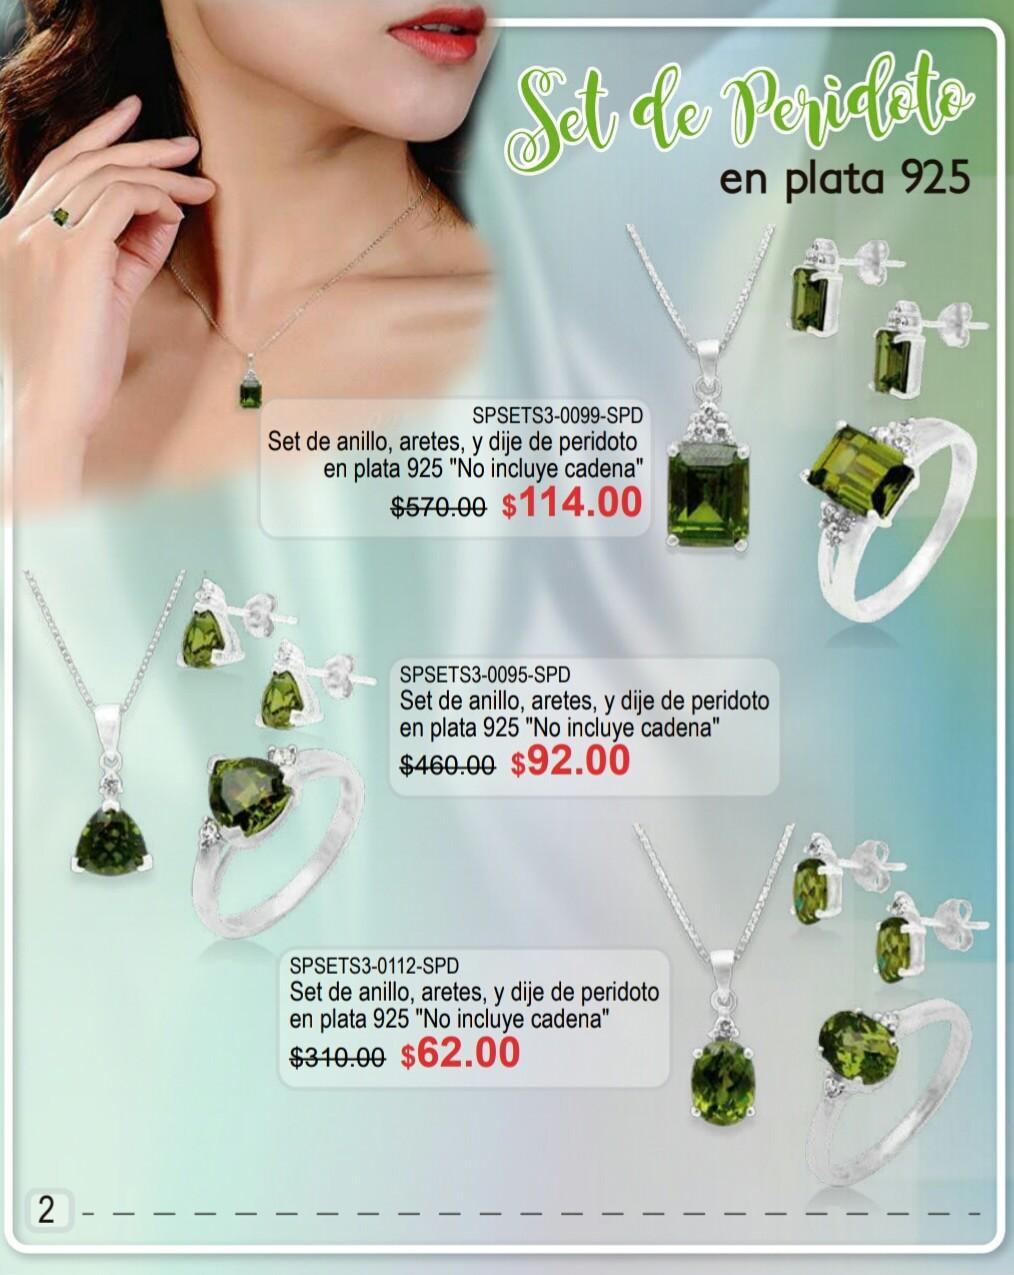 Catalogo de prendas DG Joyeros Agosto 2019 p2